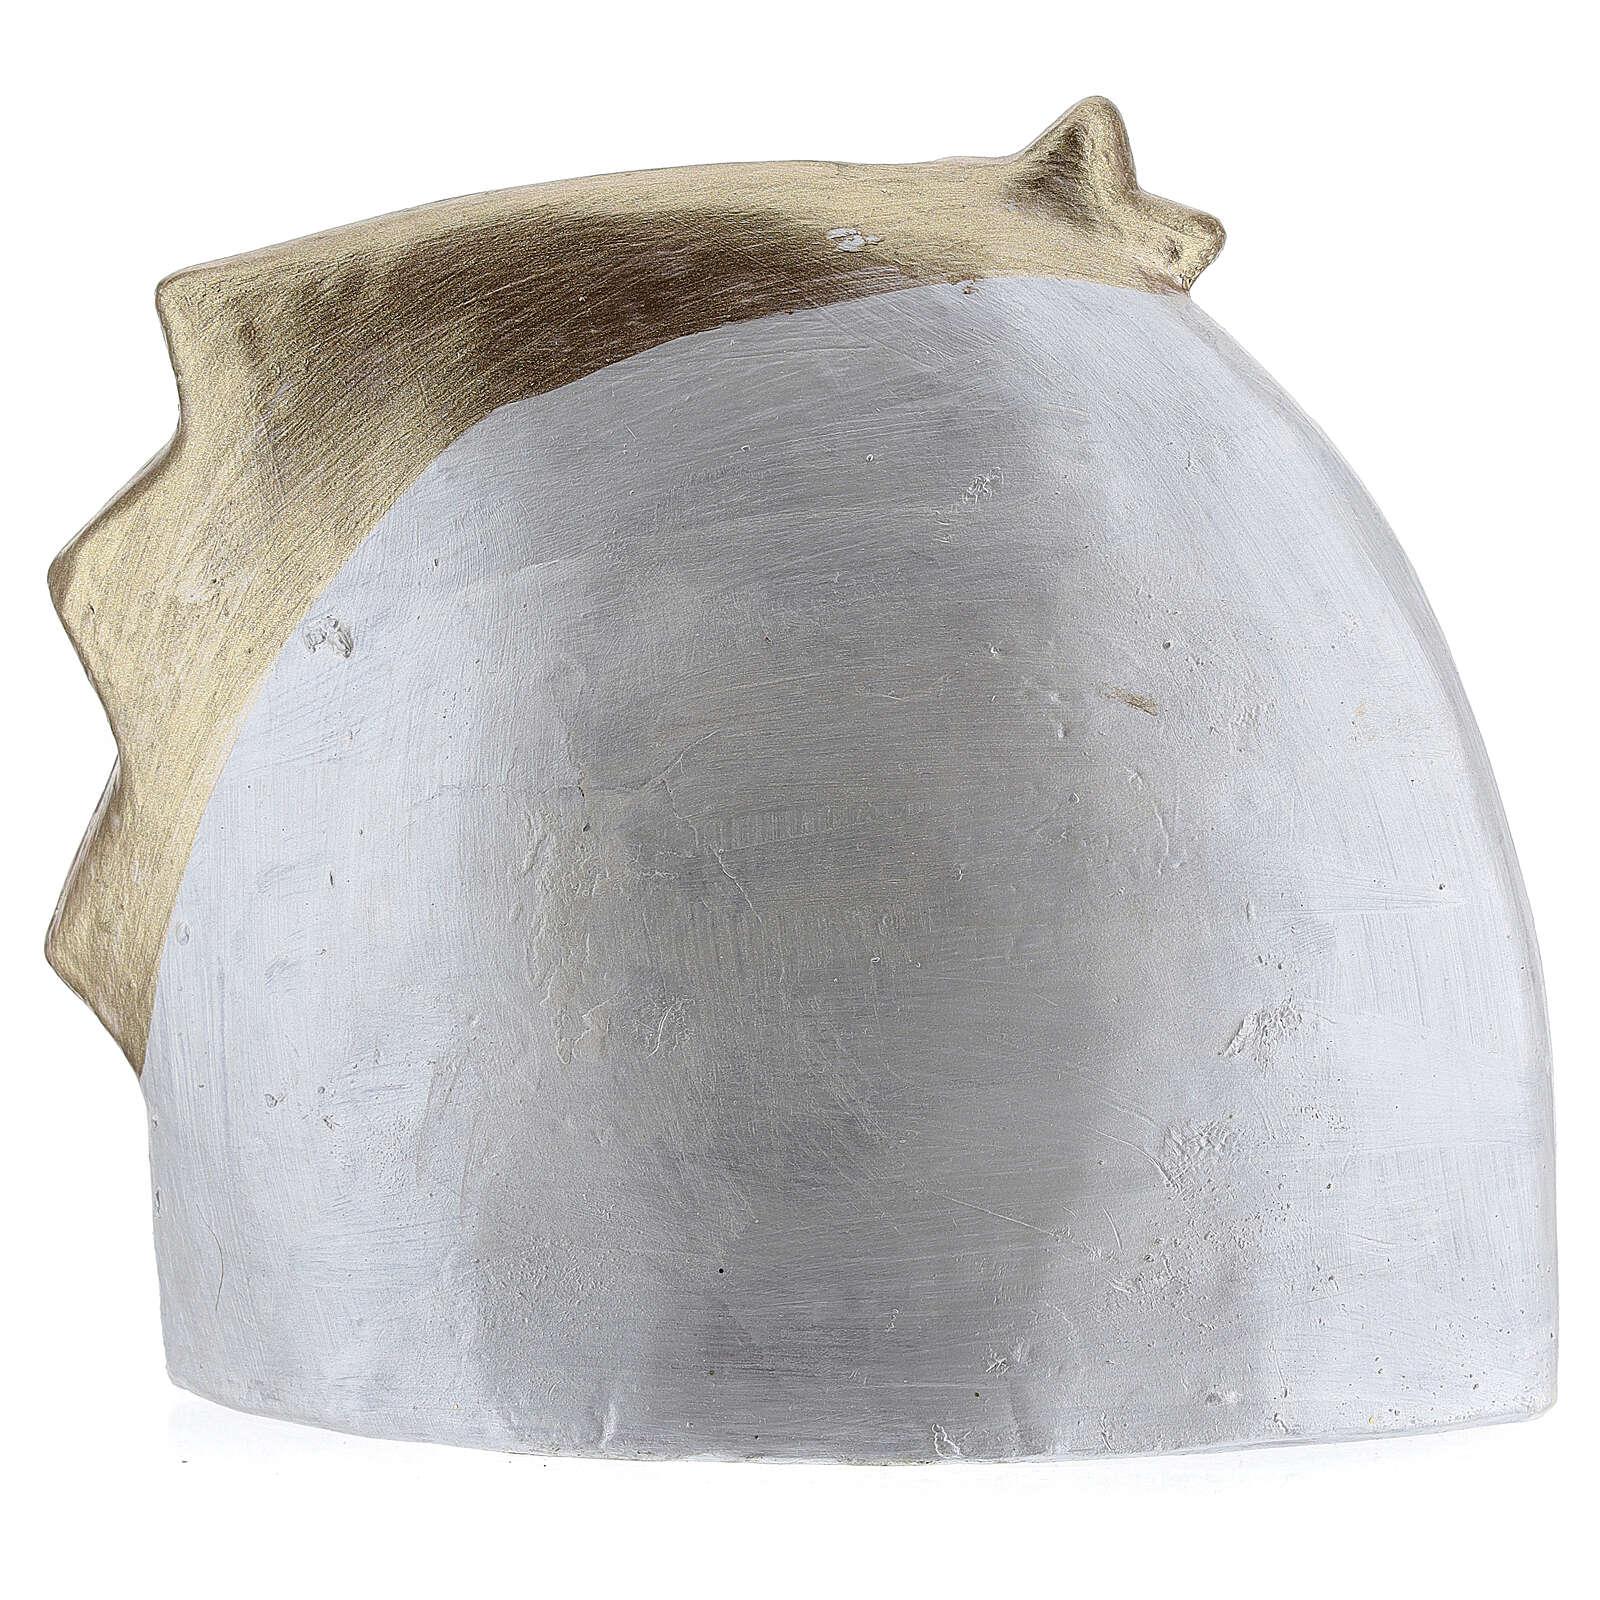 Capanna terracotta bianca stella cometa oro Deruta 14x16 cm 4